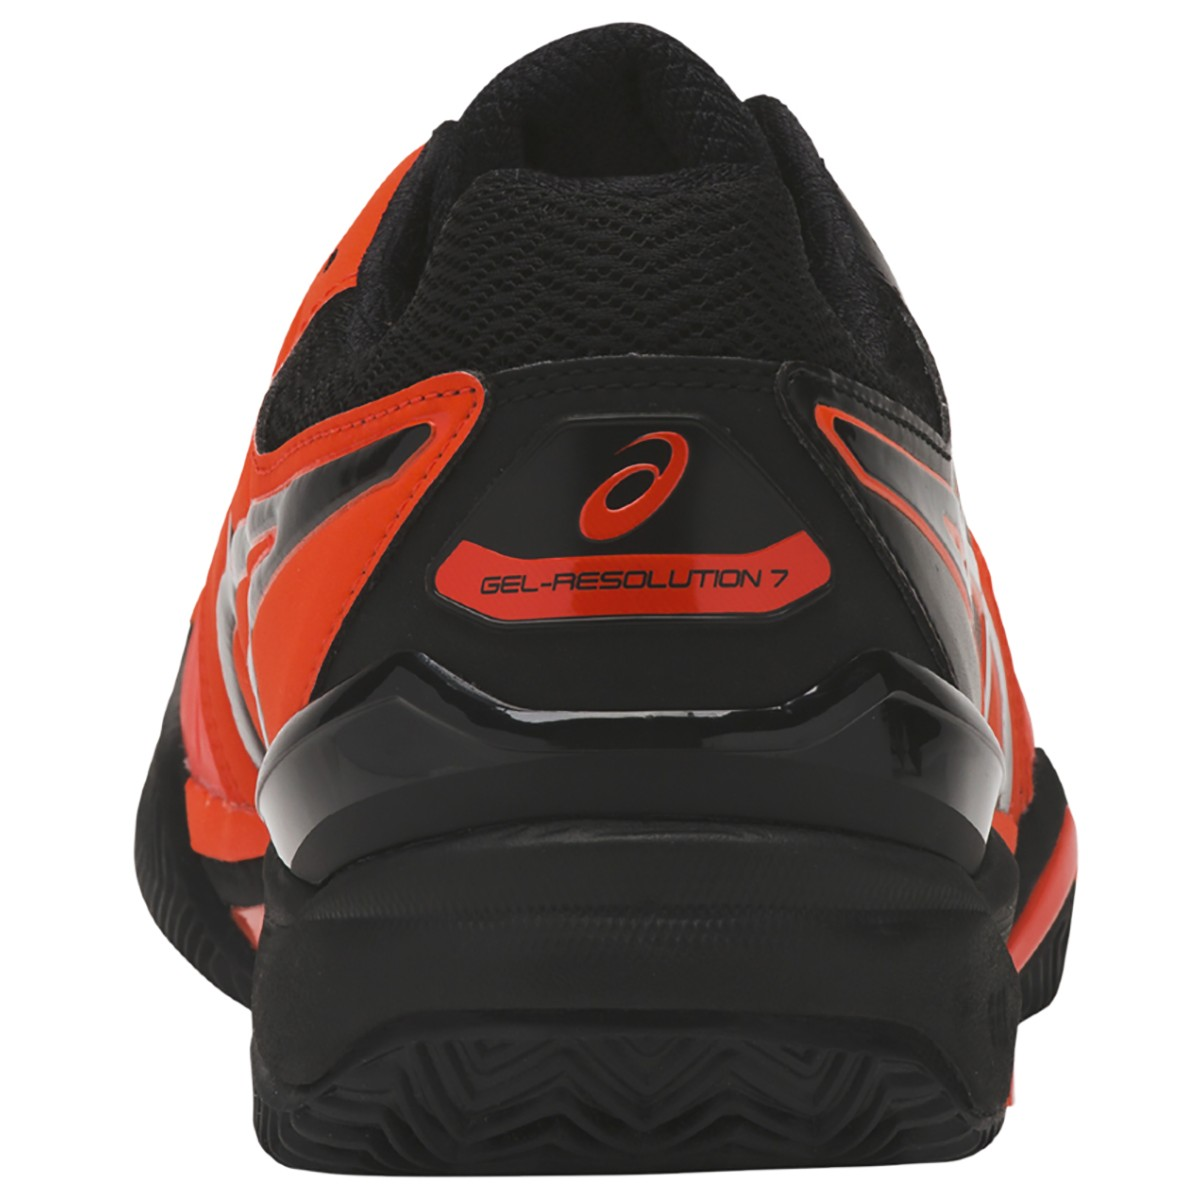 9f58db4174ffa CHAUSSURES ASICS GEL RESOLUTION 7 TERRE BATTUE - ASICS - Homme - Chaussures  | Tennispro